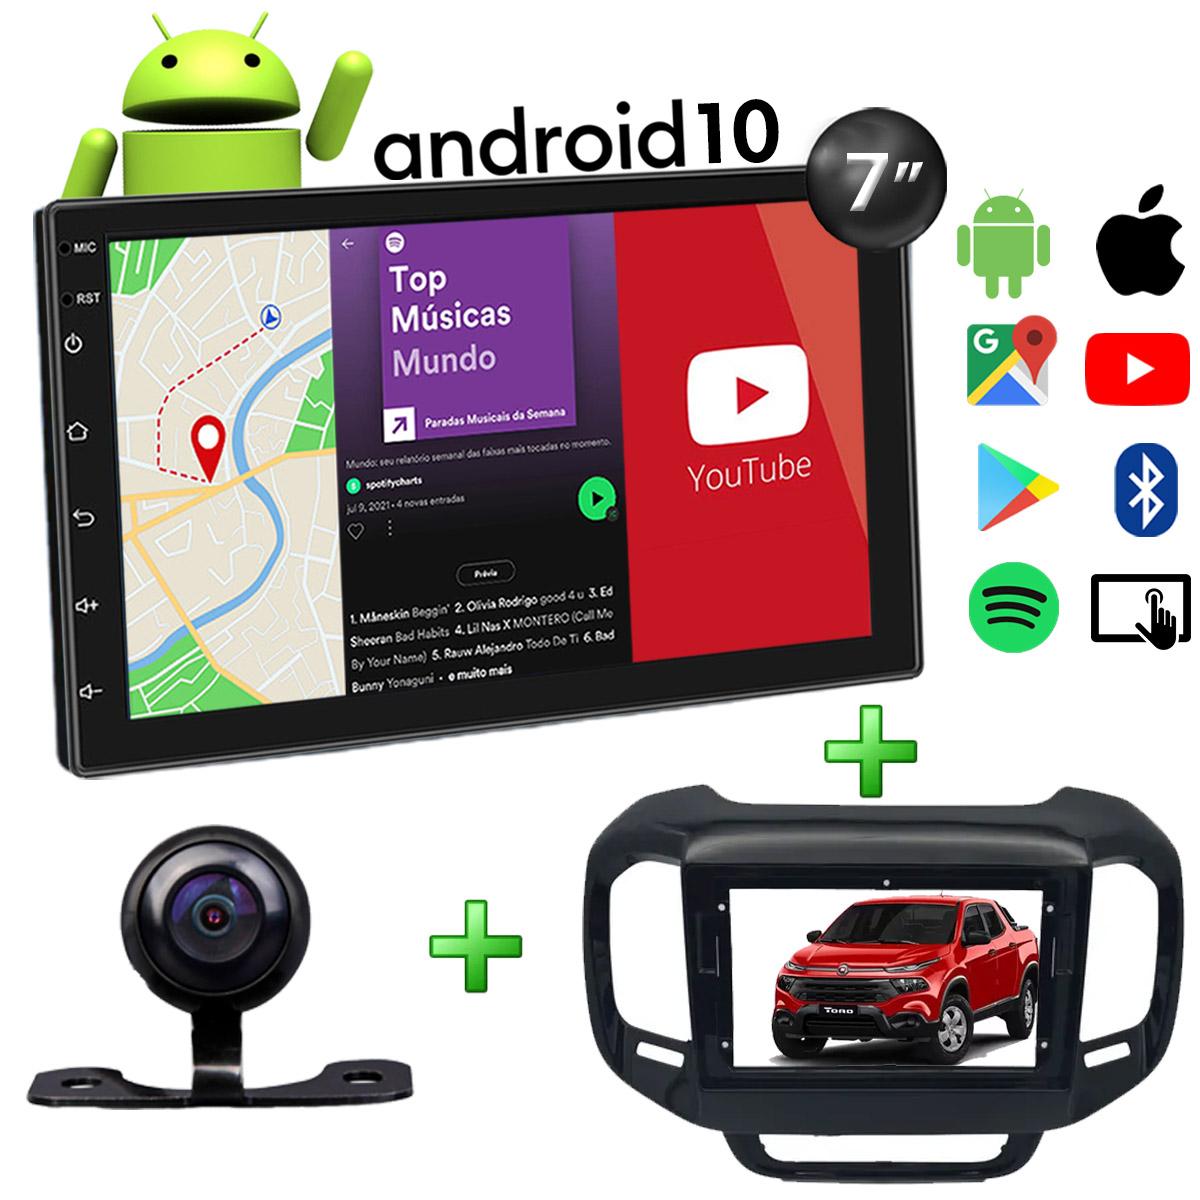 Central Multimídia Fiat Toro Muzik Android com Câmera 7 Polegadas 2 Din Moldura Black Piano Atacado Poliparts